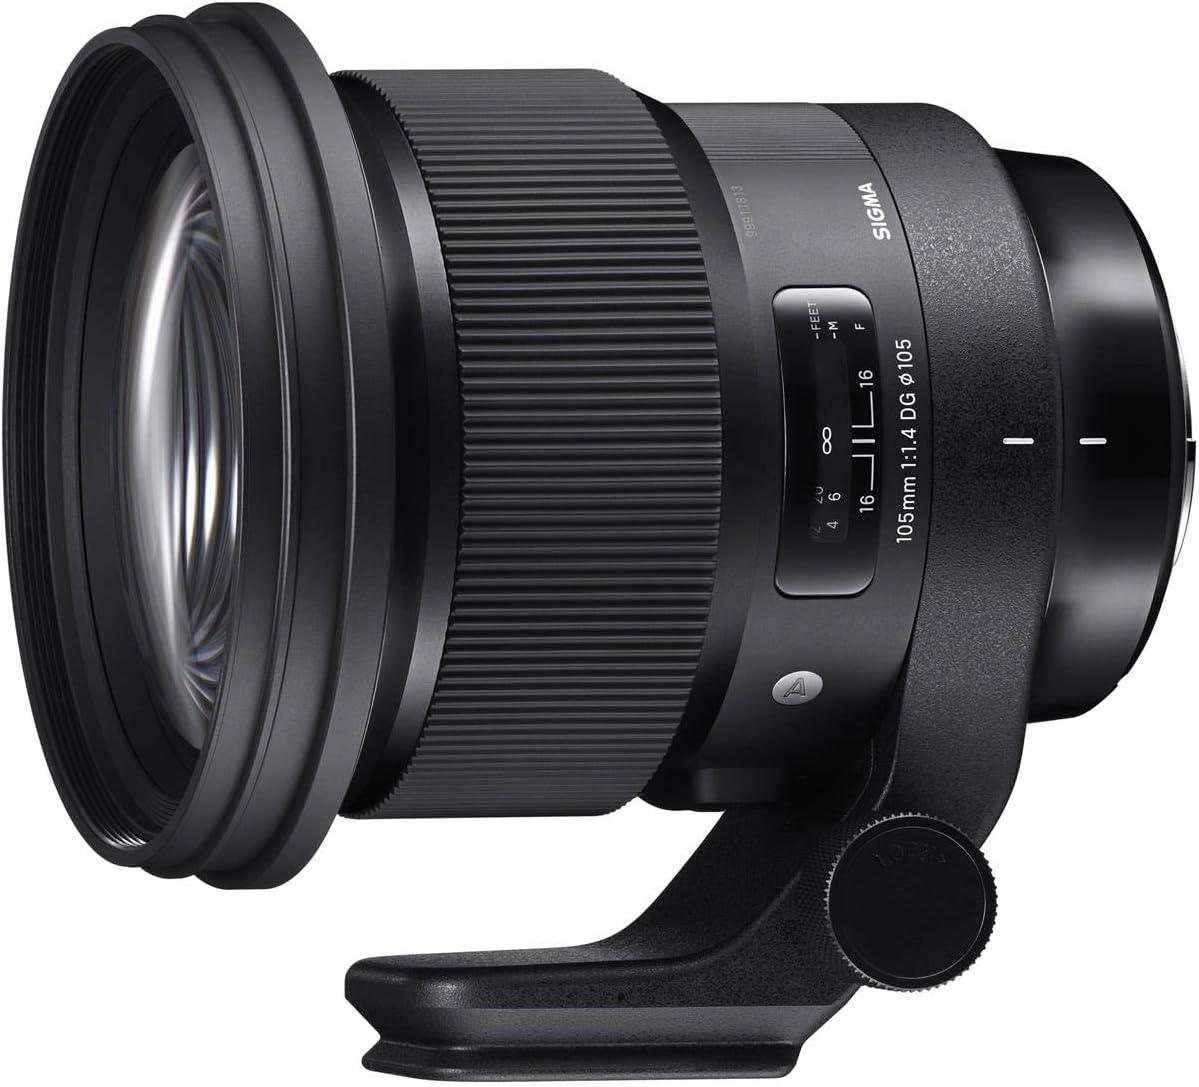 Sigma 105mm f/1.4 DG Art HSM Lens for Leica L-Mount Cameras